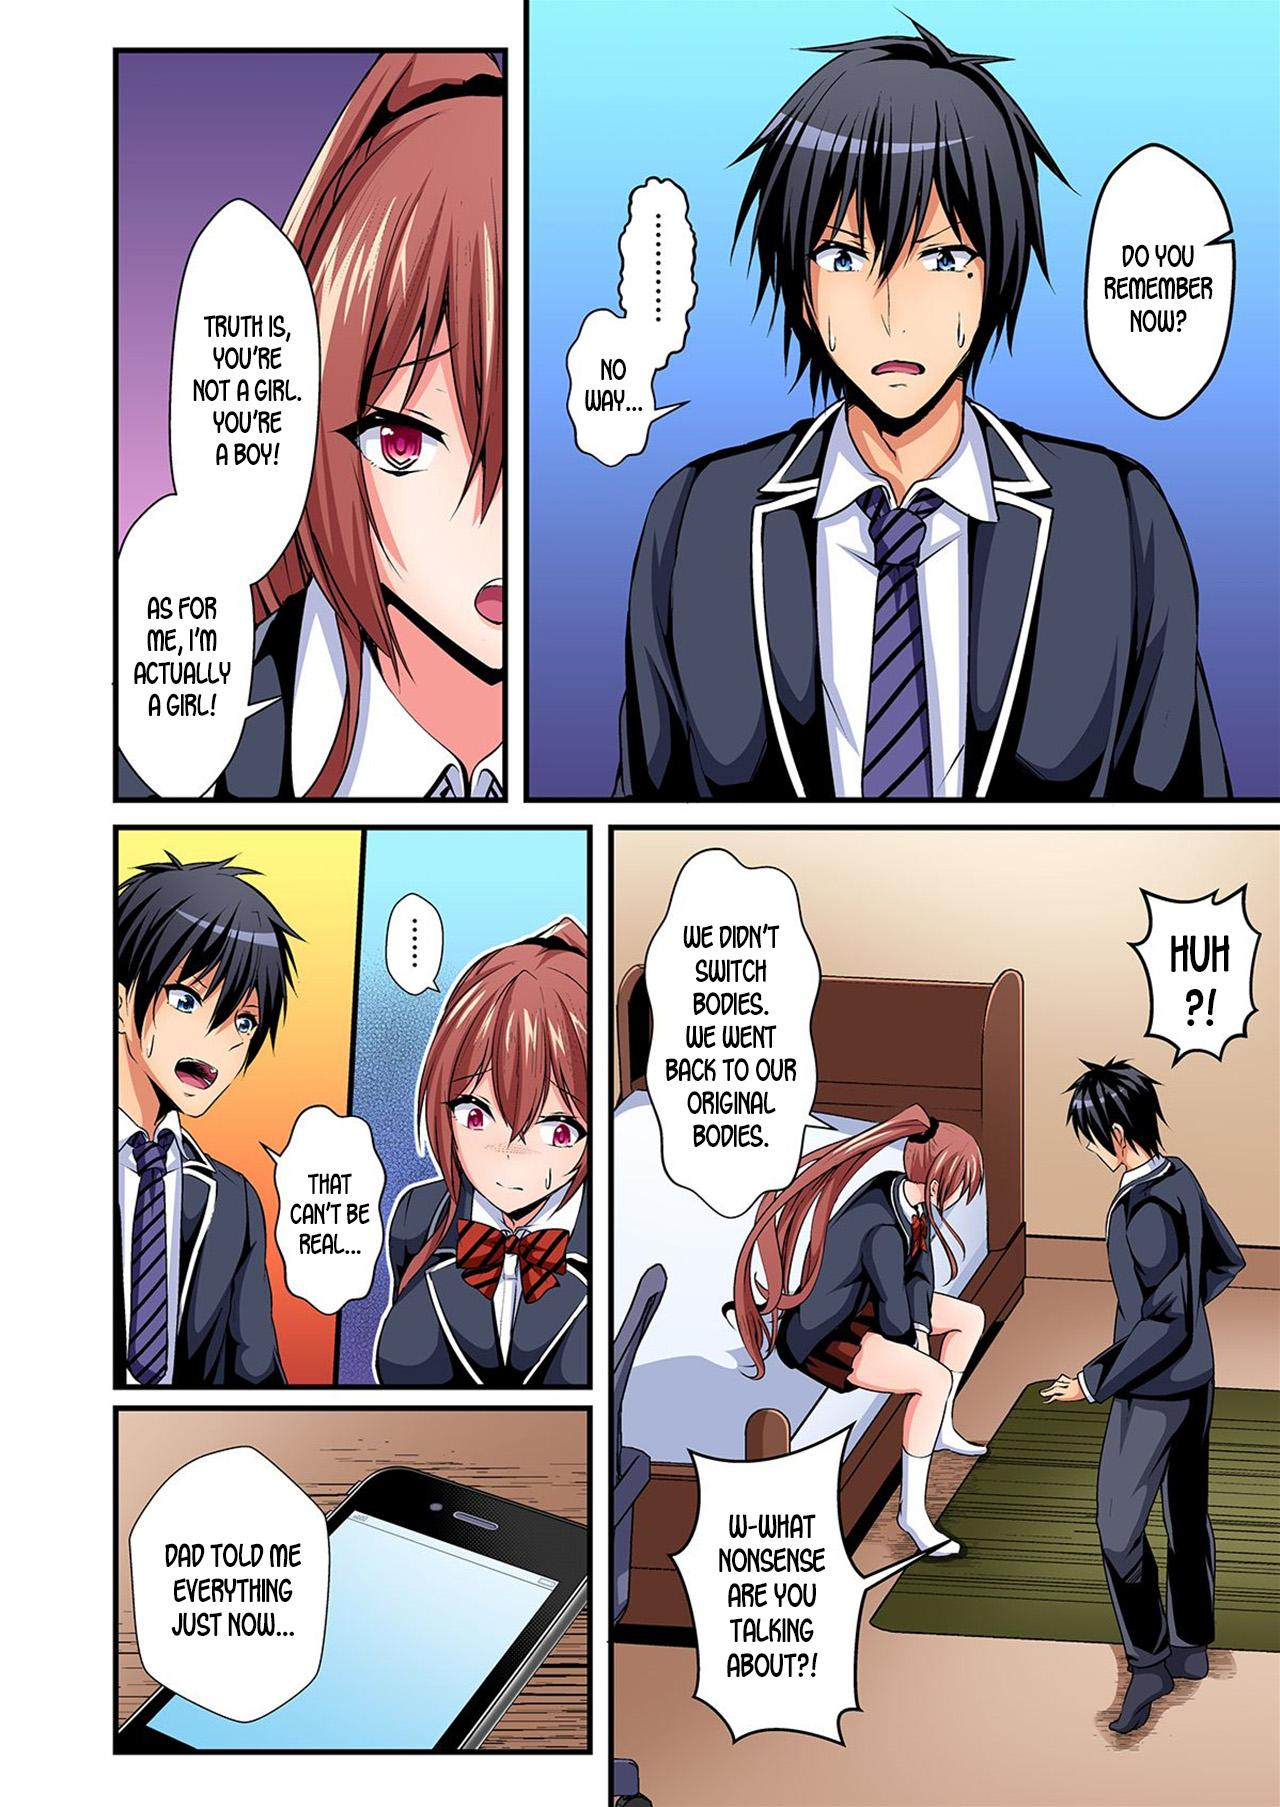 [Suishin Tenra] Irekawatte Dotabata Ecchi! ~Aya-nee no Binkan na Karada ni Ore wa Taerarenai  | Switch bodies and have noisy sex! I can't stand Ayanee's sensitive body 1-6 [English] [desudesu] 104